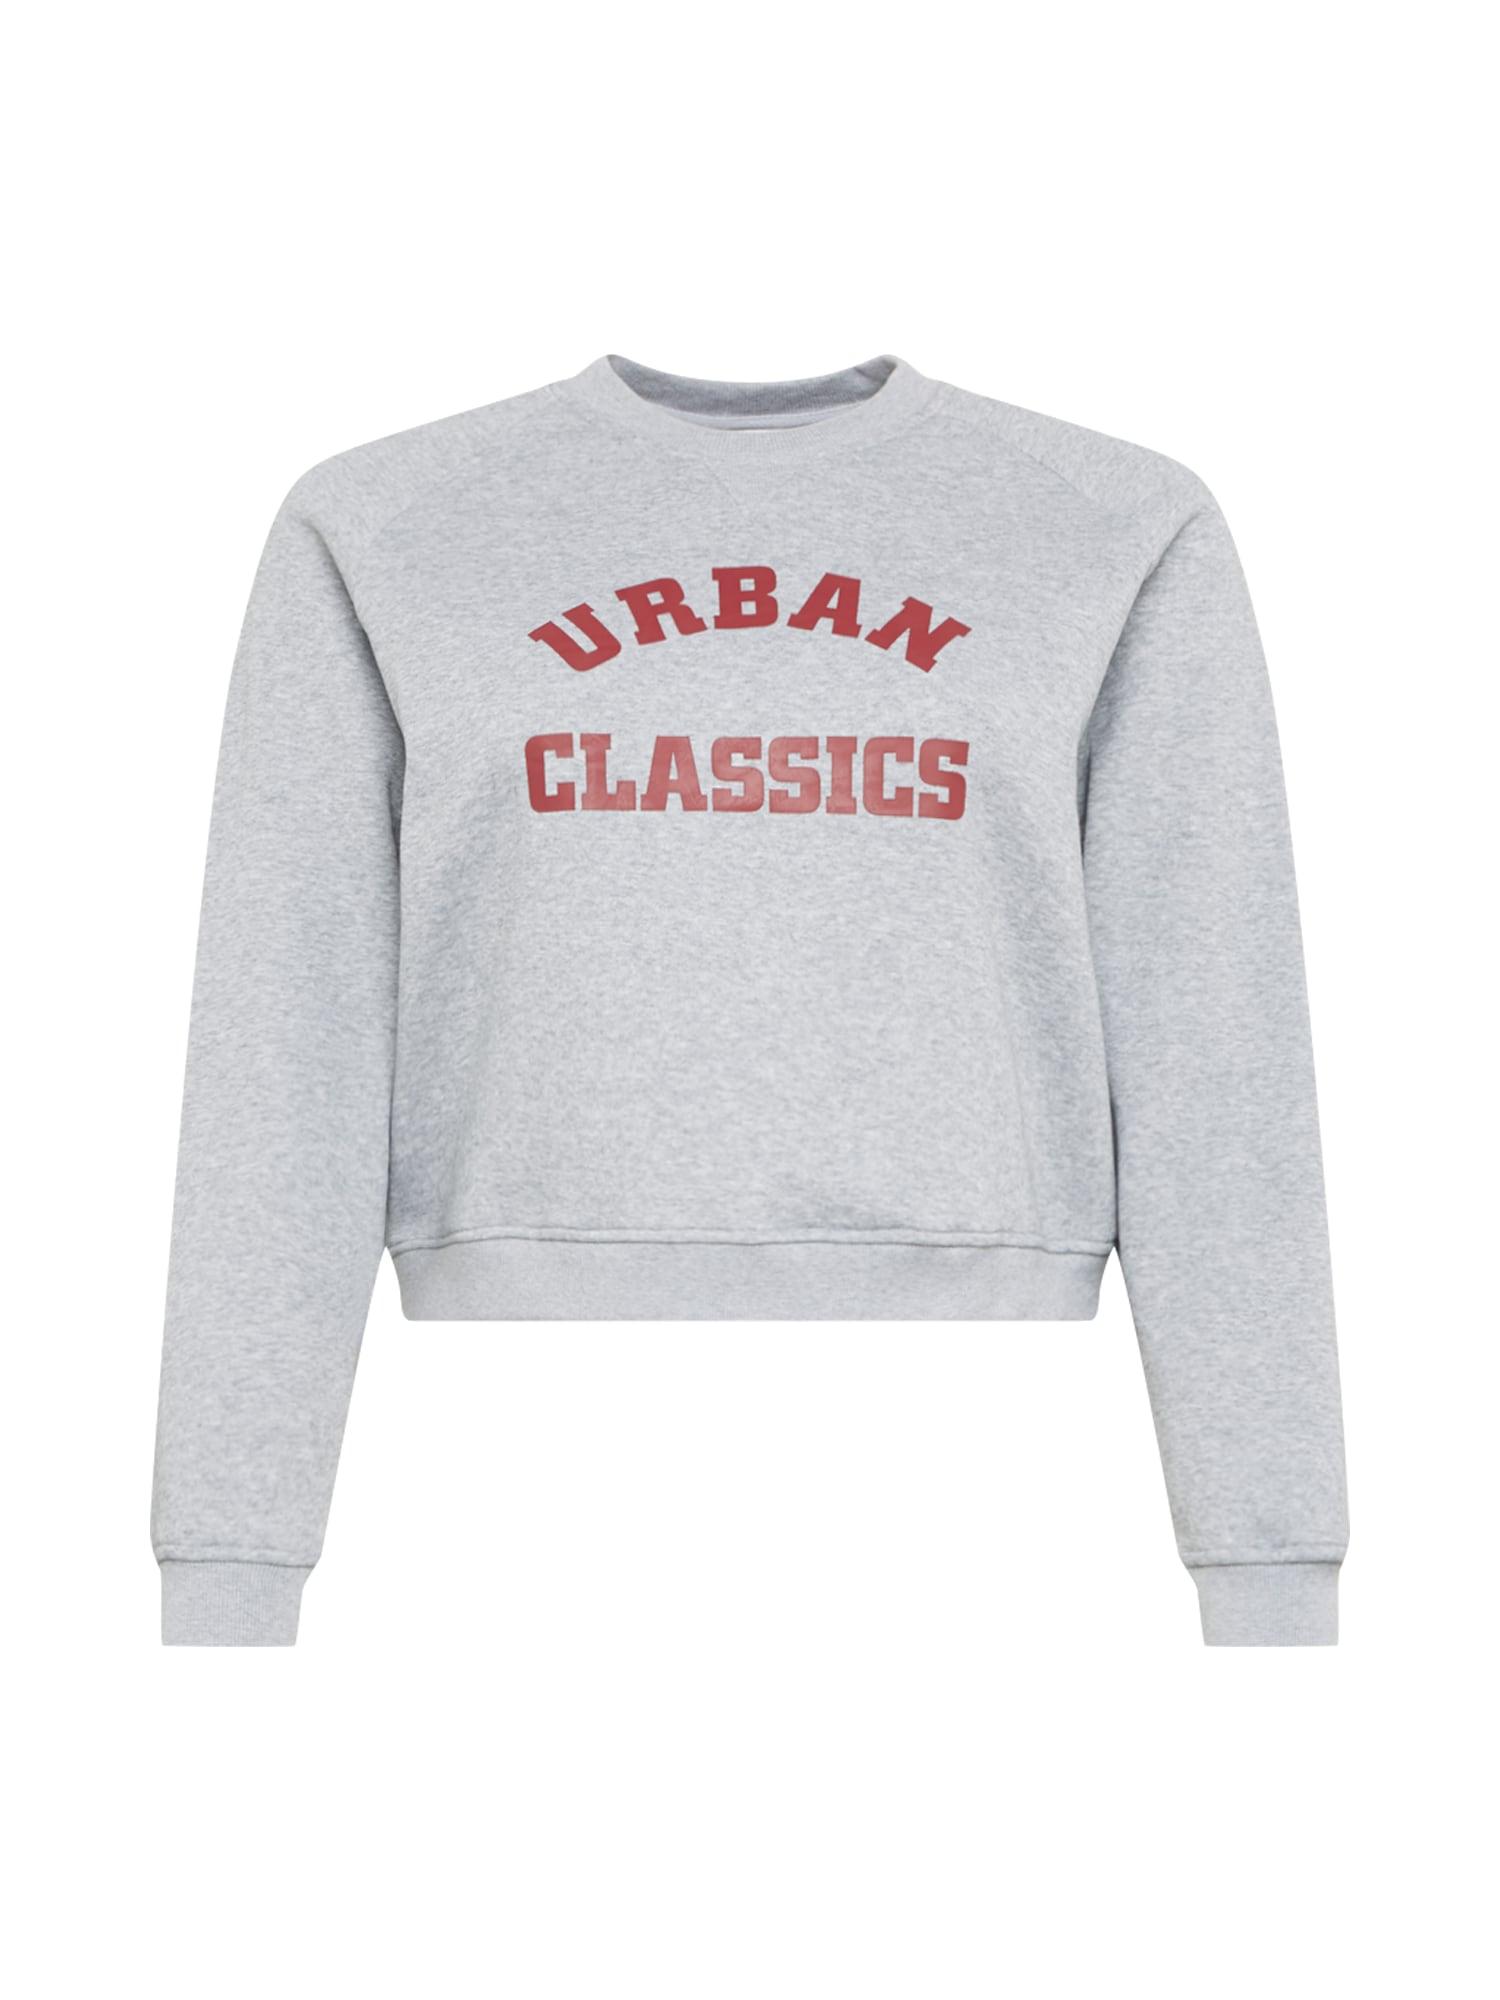 Urban Classics Curvy Sweat-shirt  - Gris - Taille: 4XL - female